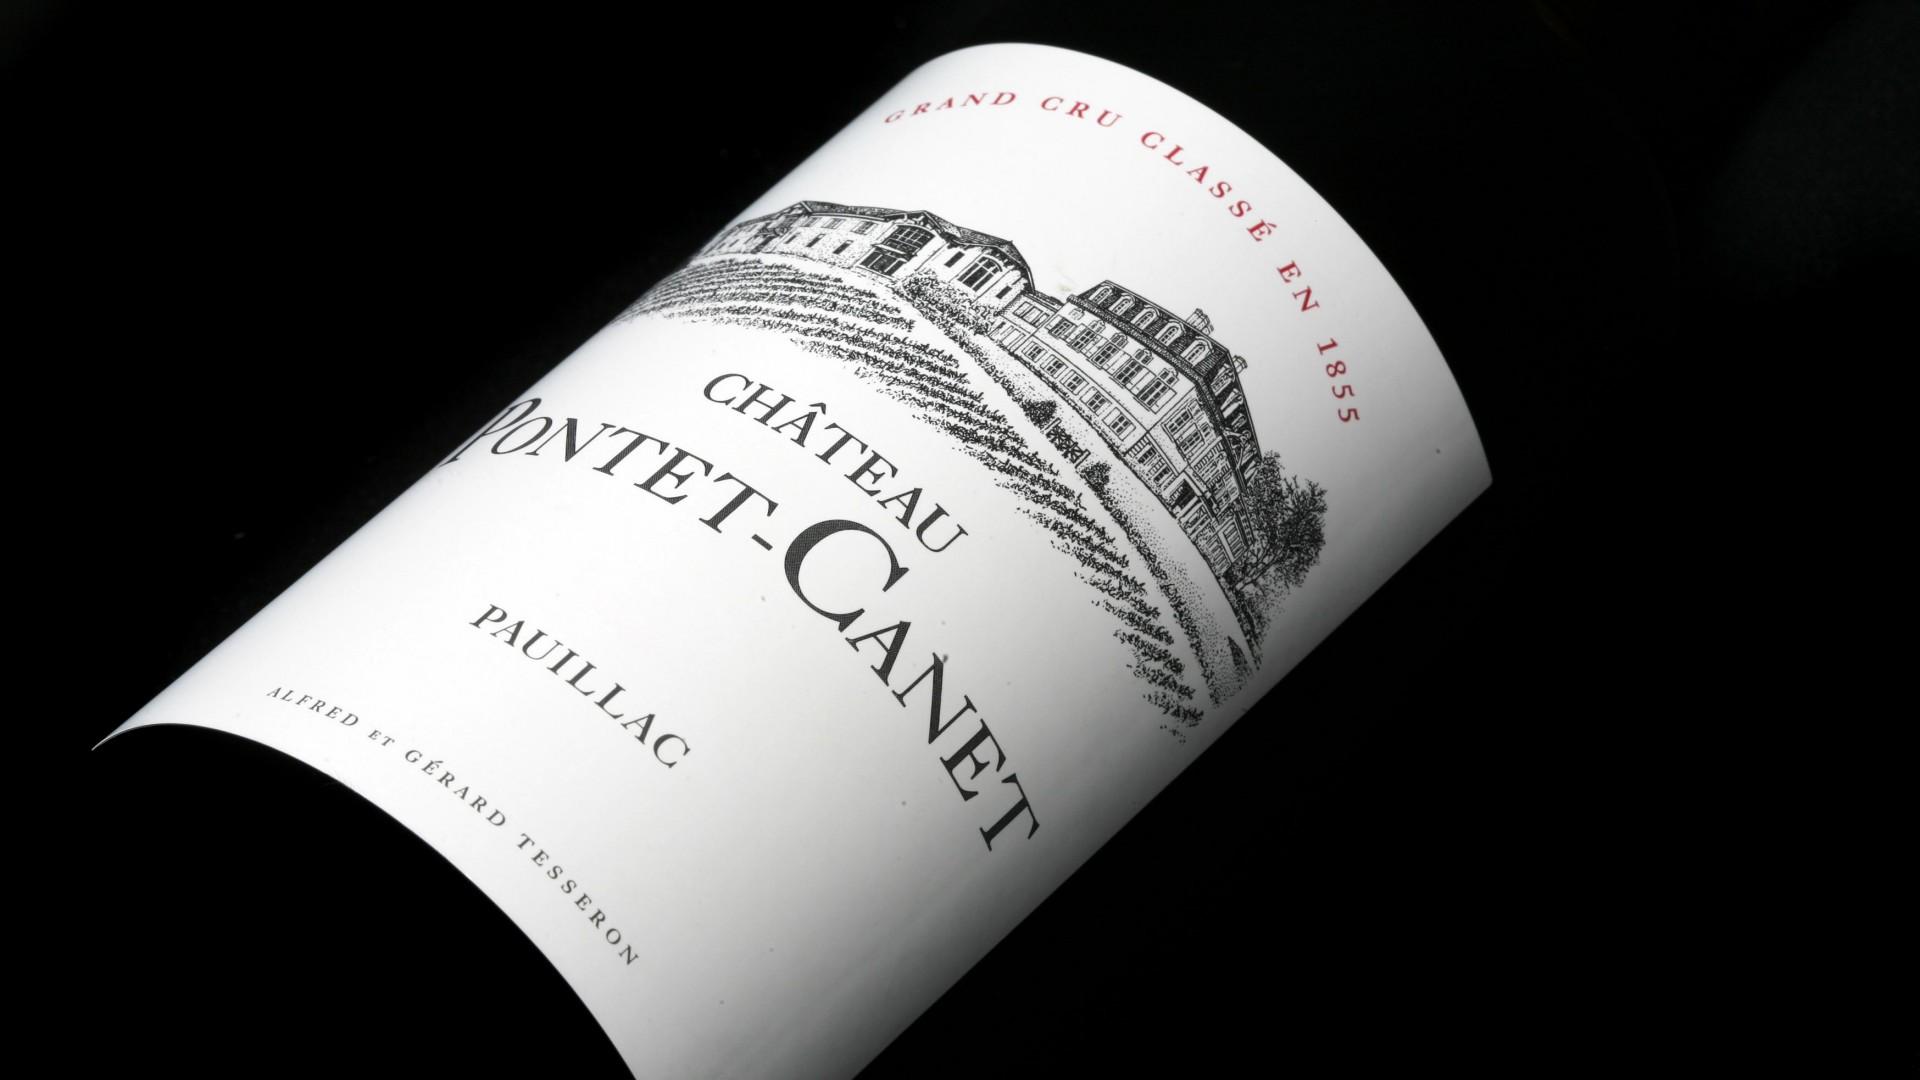 Pontet-Canet 2010 & Montrose 2010